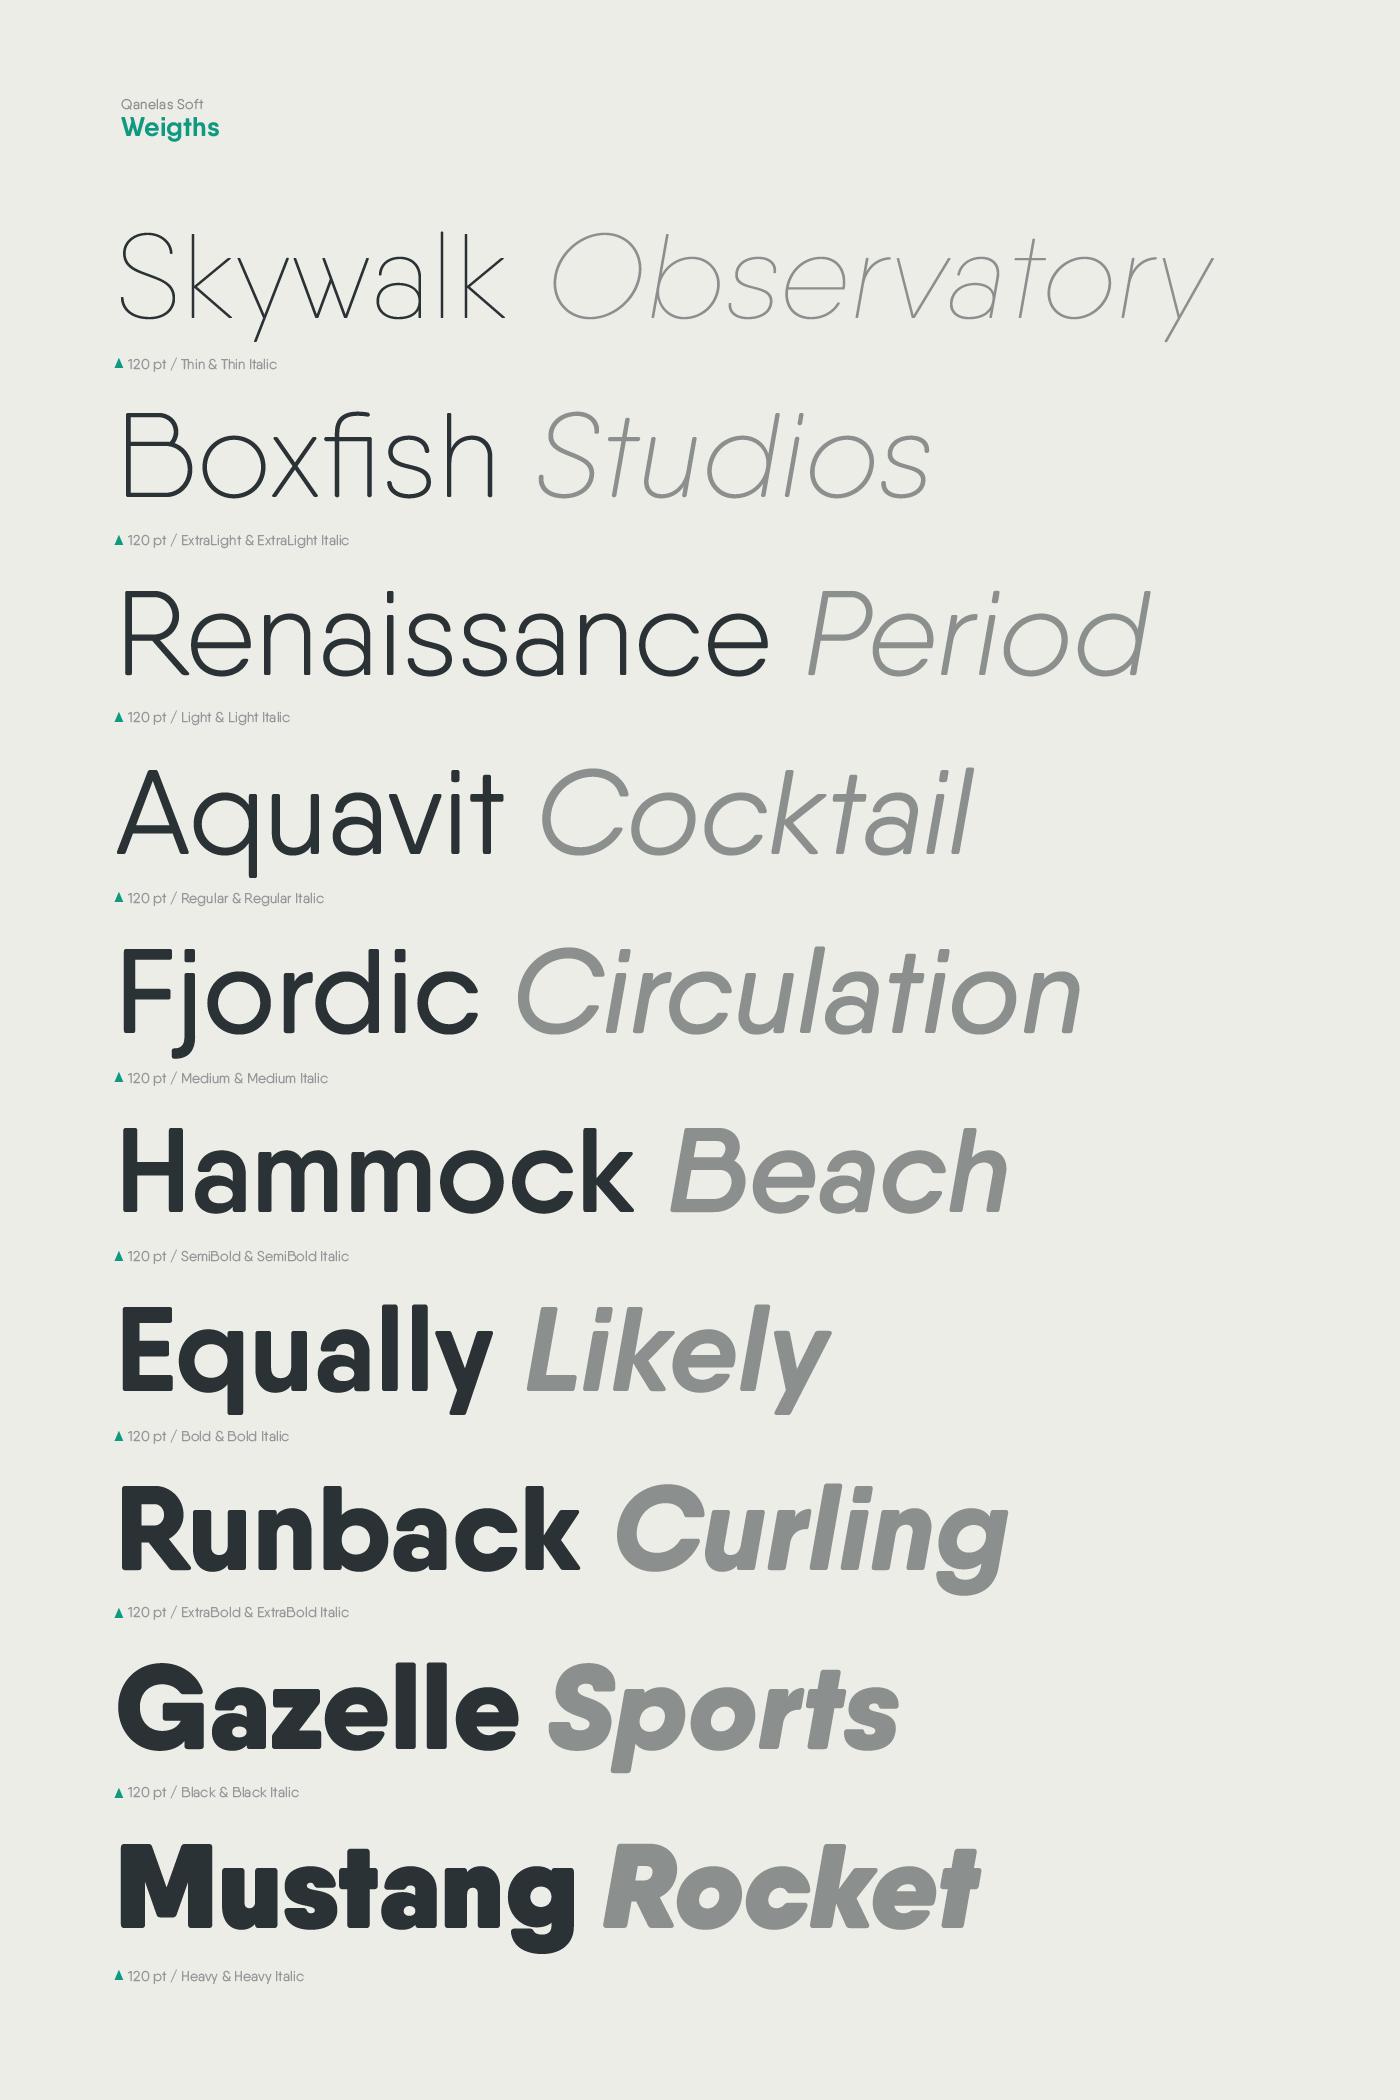 Qanelas Soft: 3 Free font weights